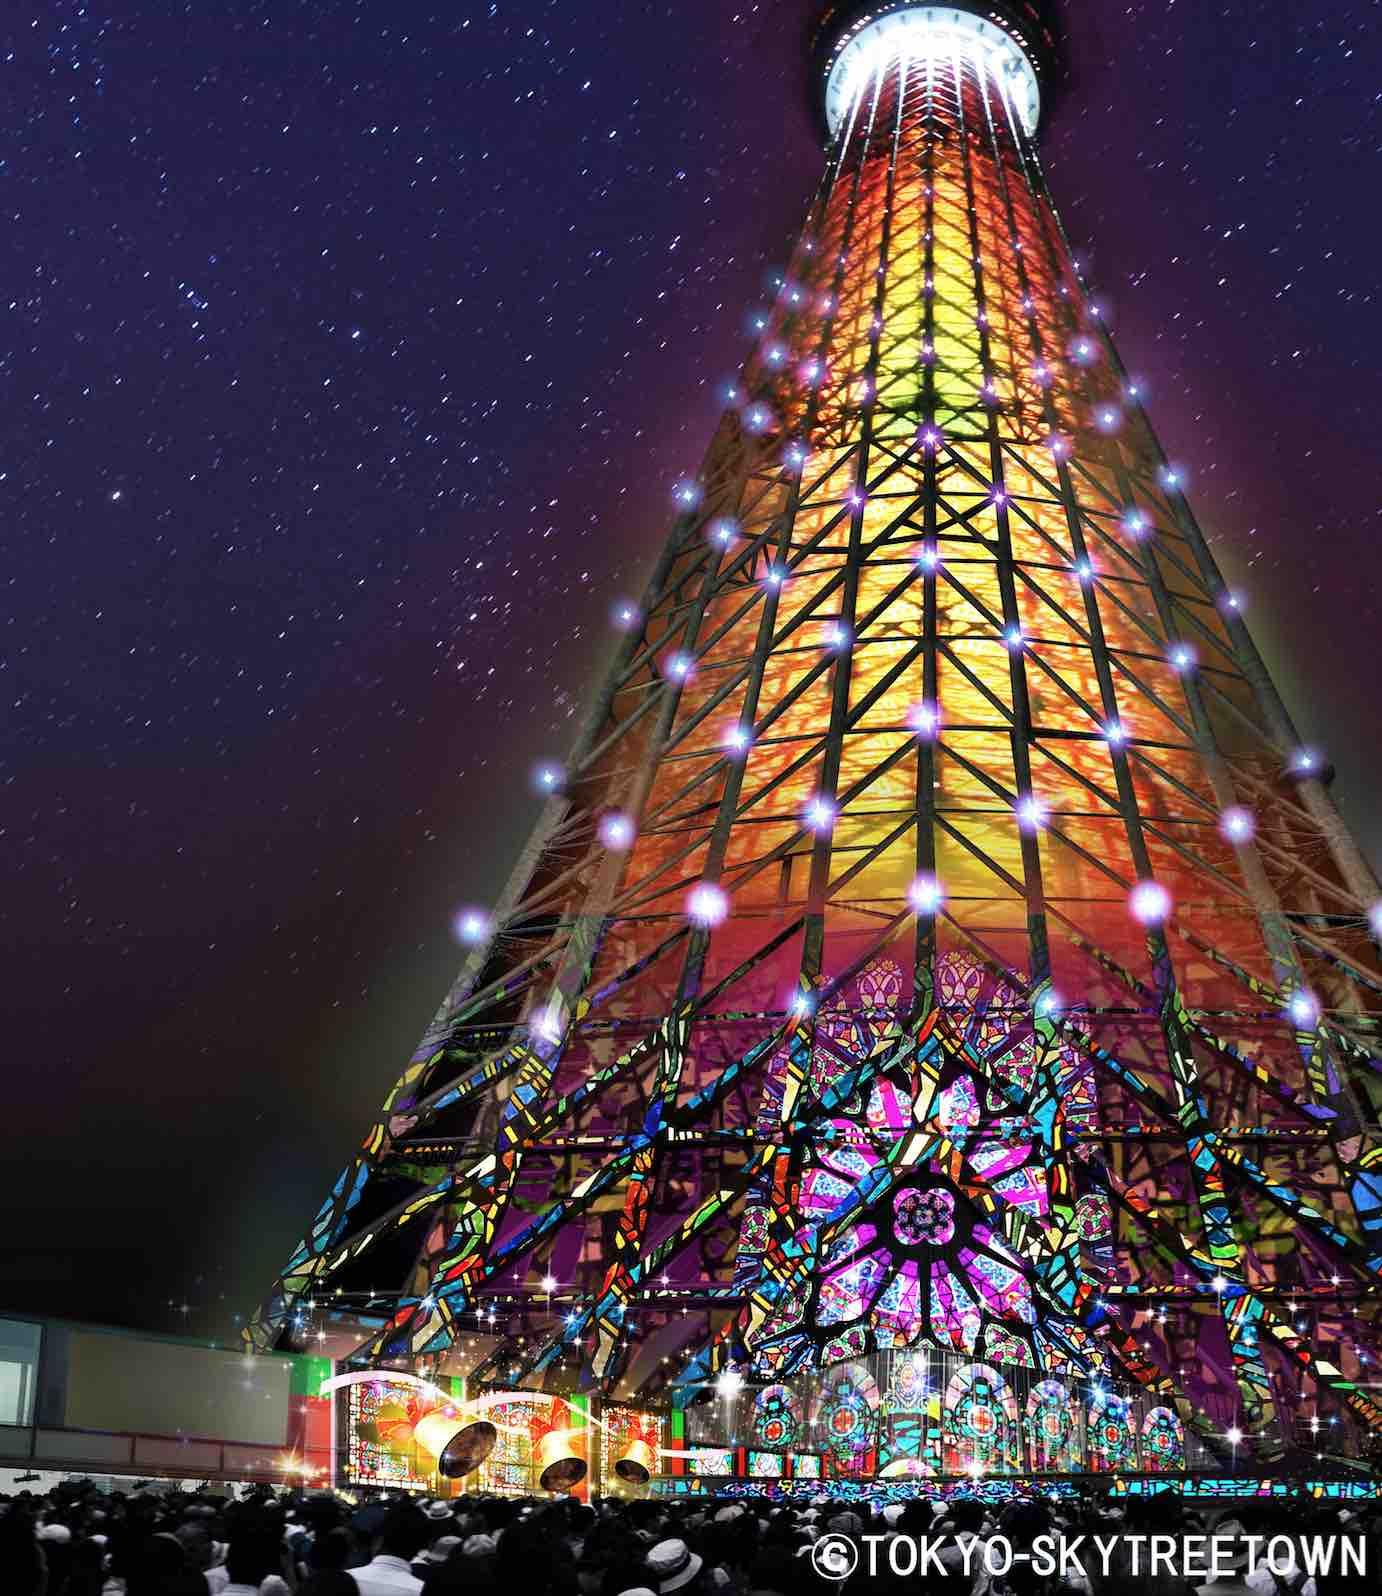 tokyo-skytree-town-dream-christmas-aspirantsg